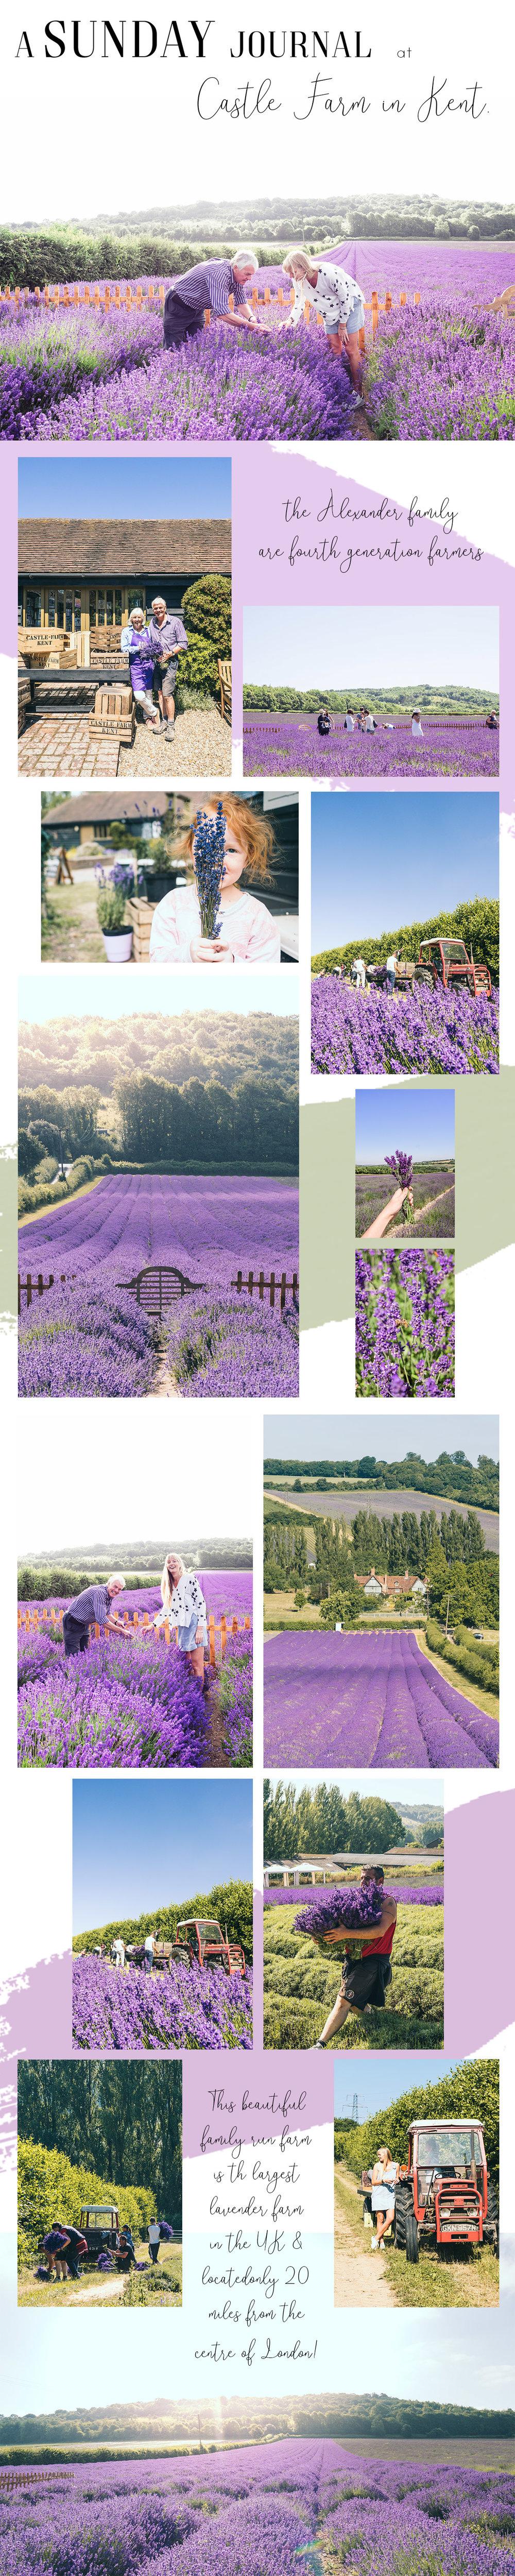 Castle Farm.jpg